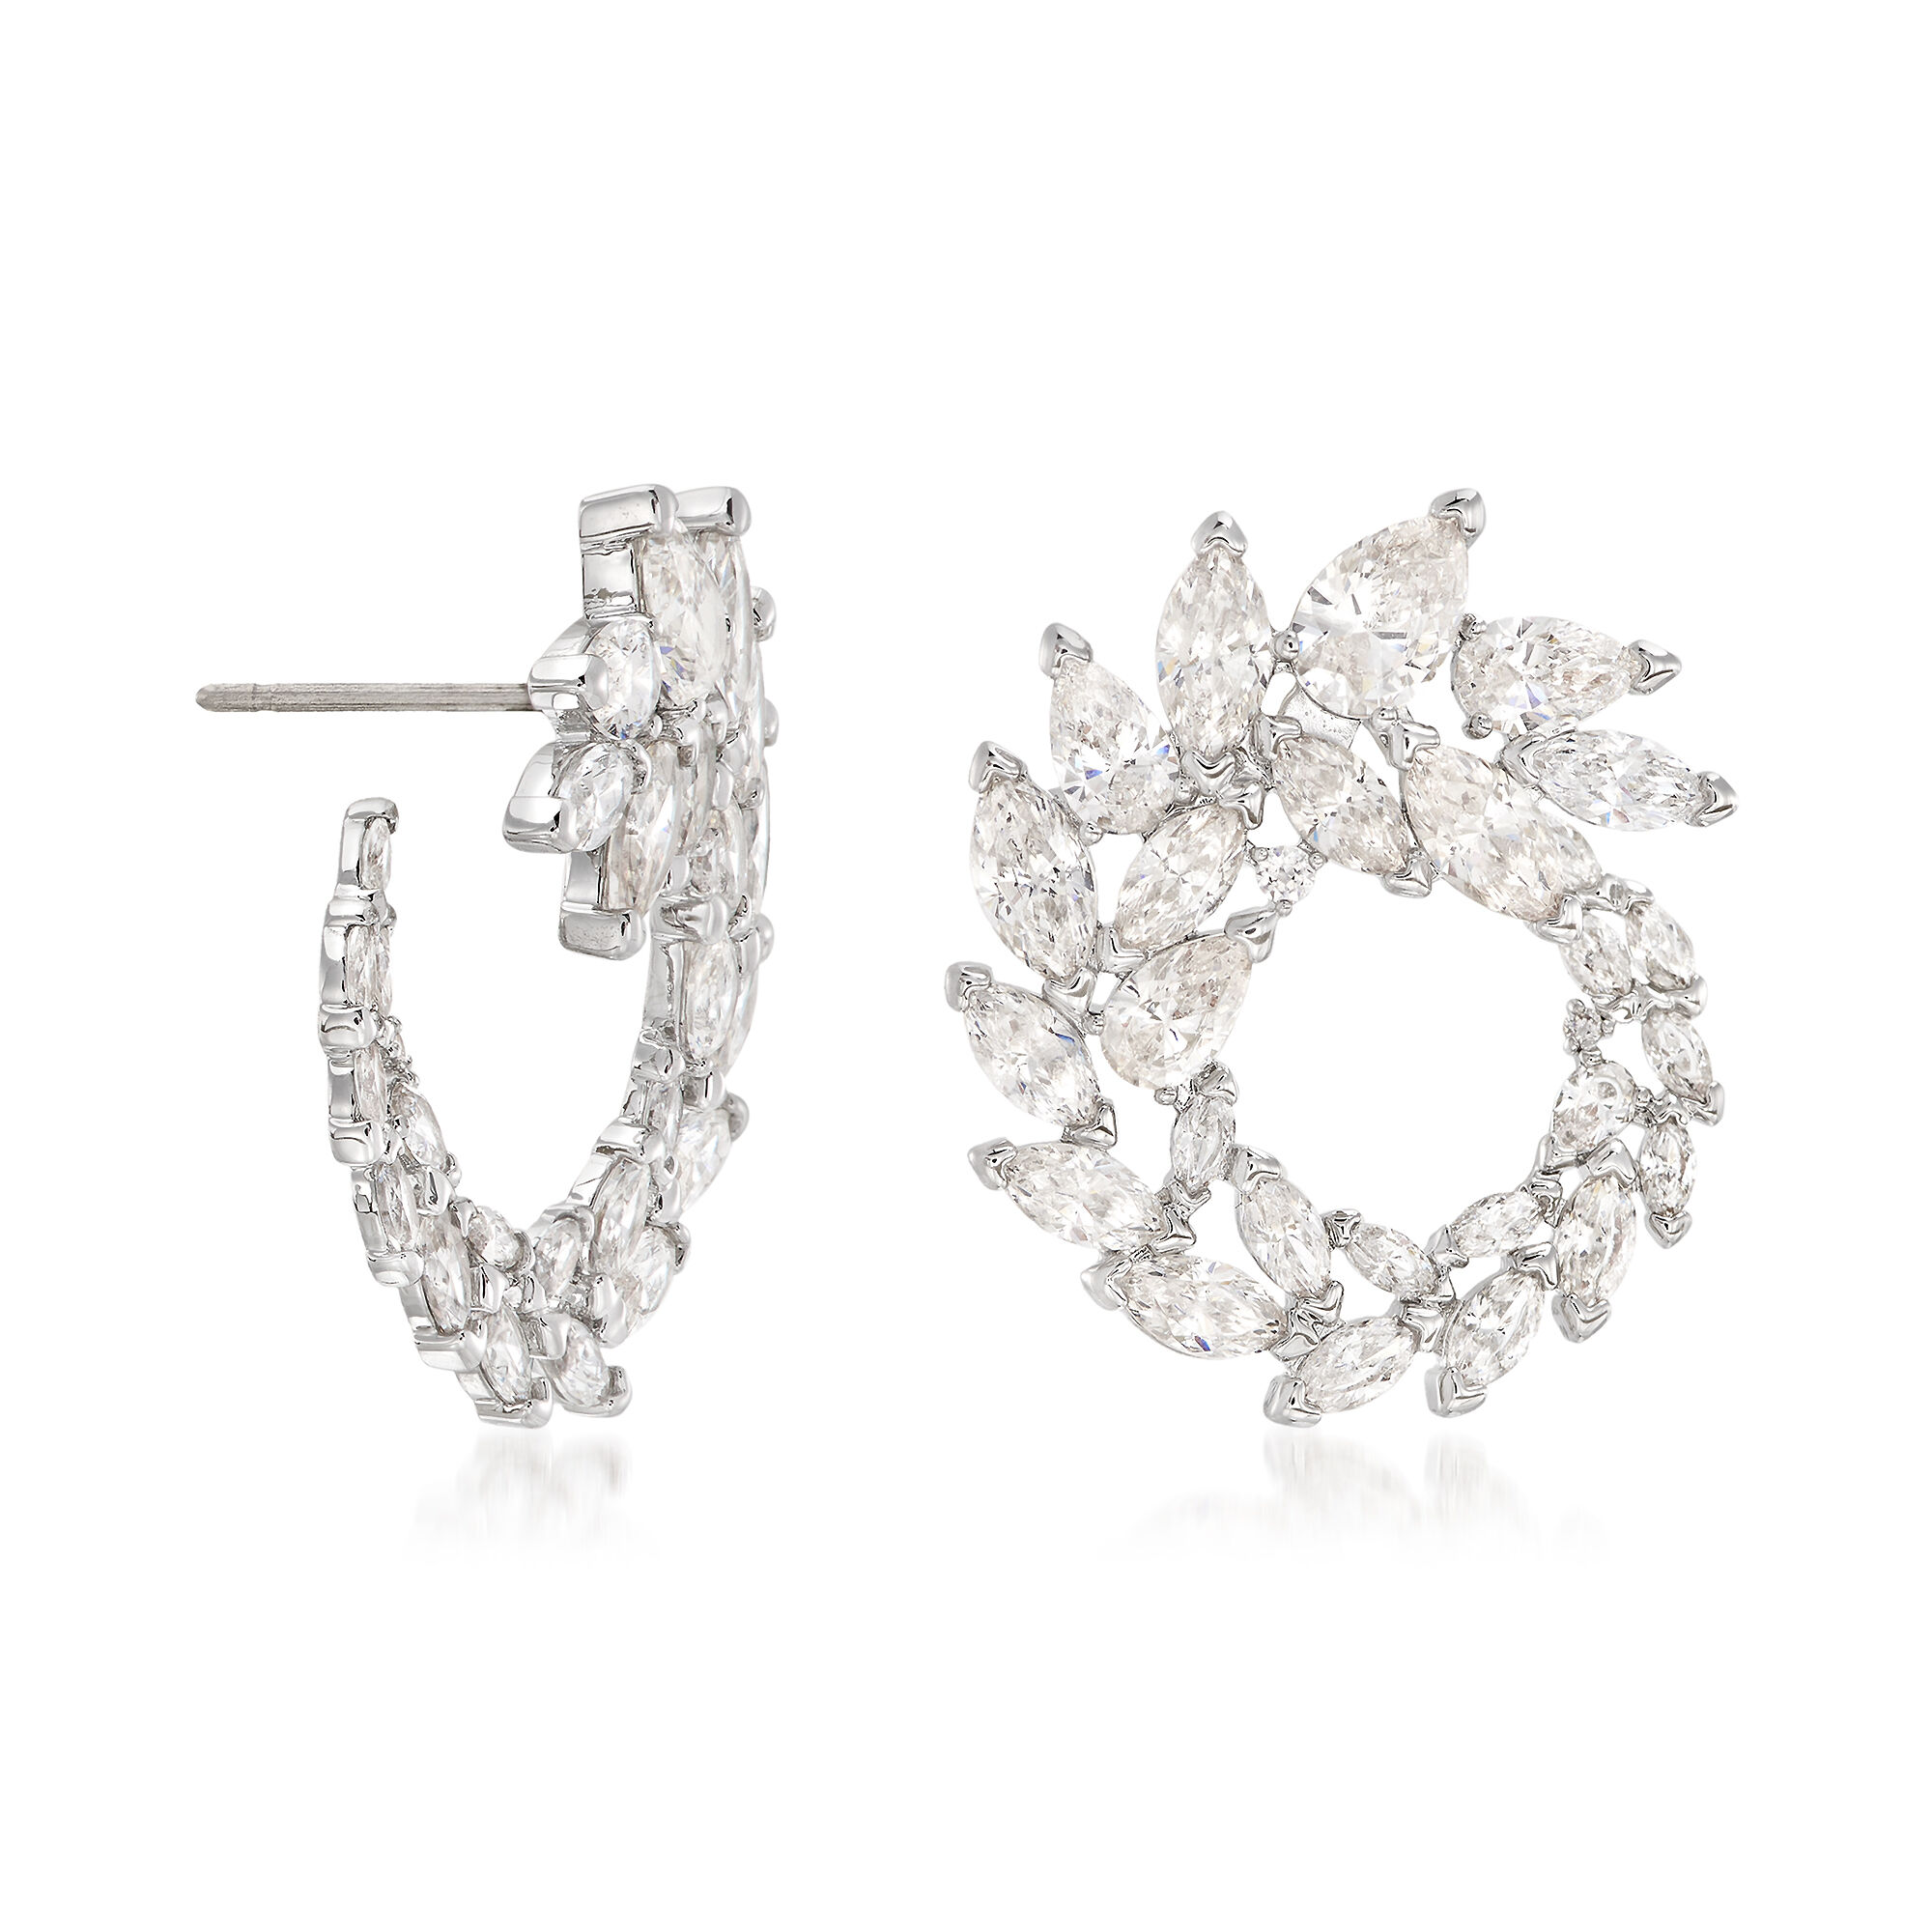 Rhinestone crystal fashion Stud Earrings  Round Sparkle /& Shine Chic Bride GIFT